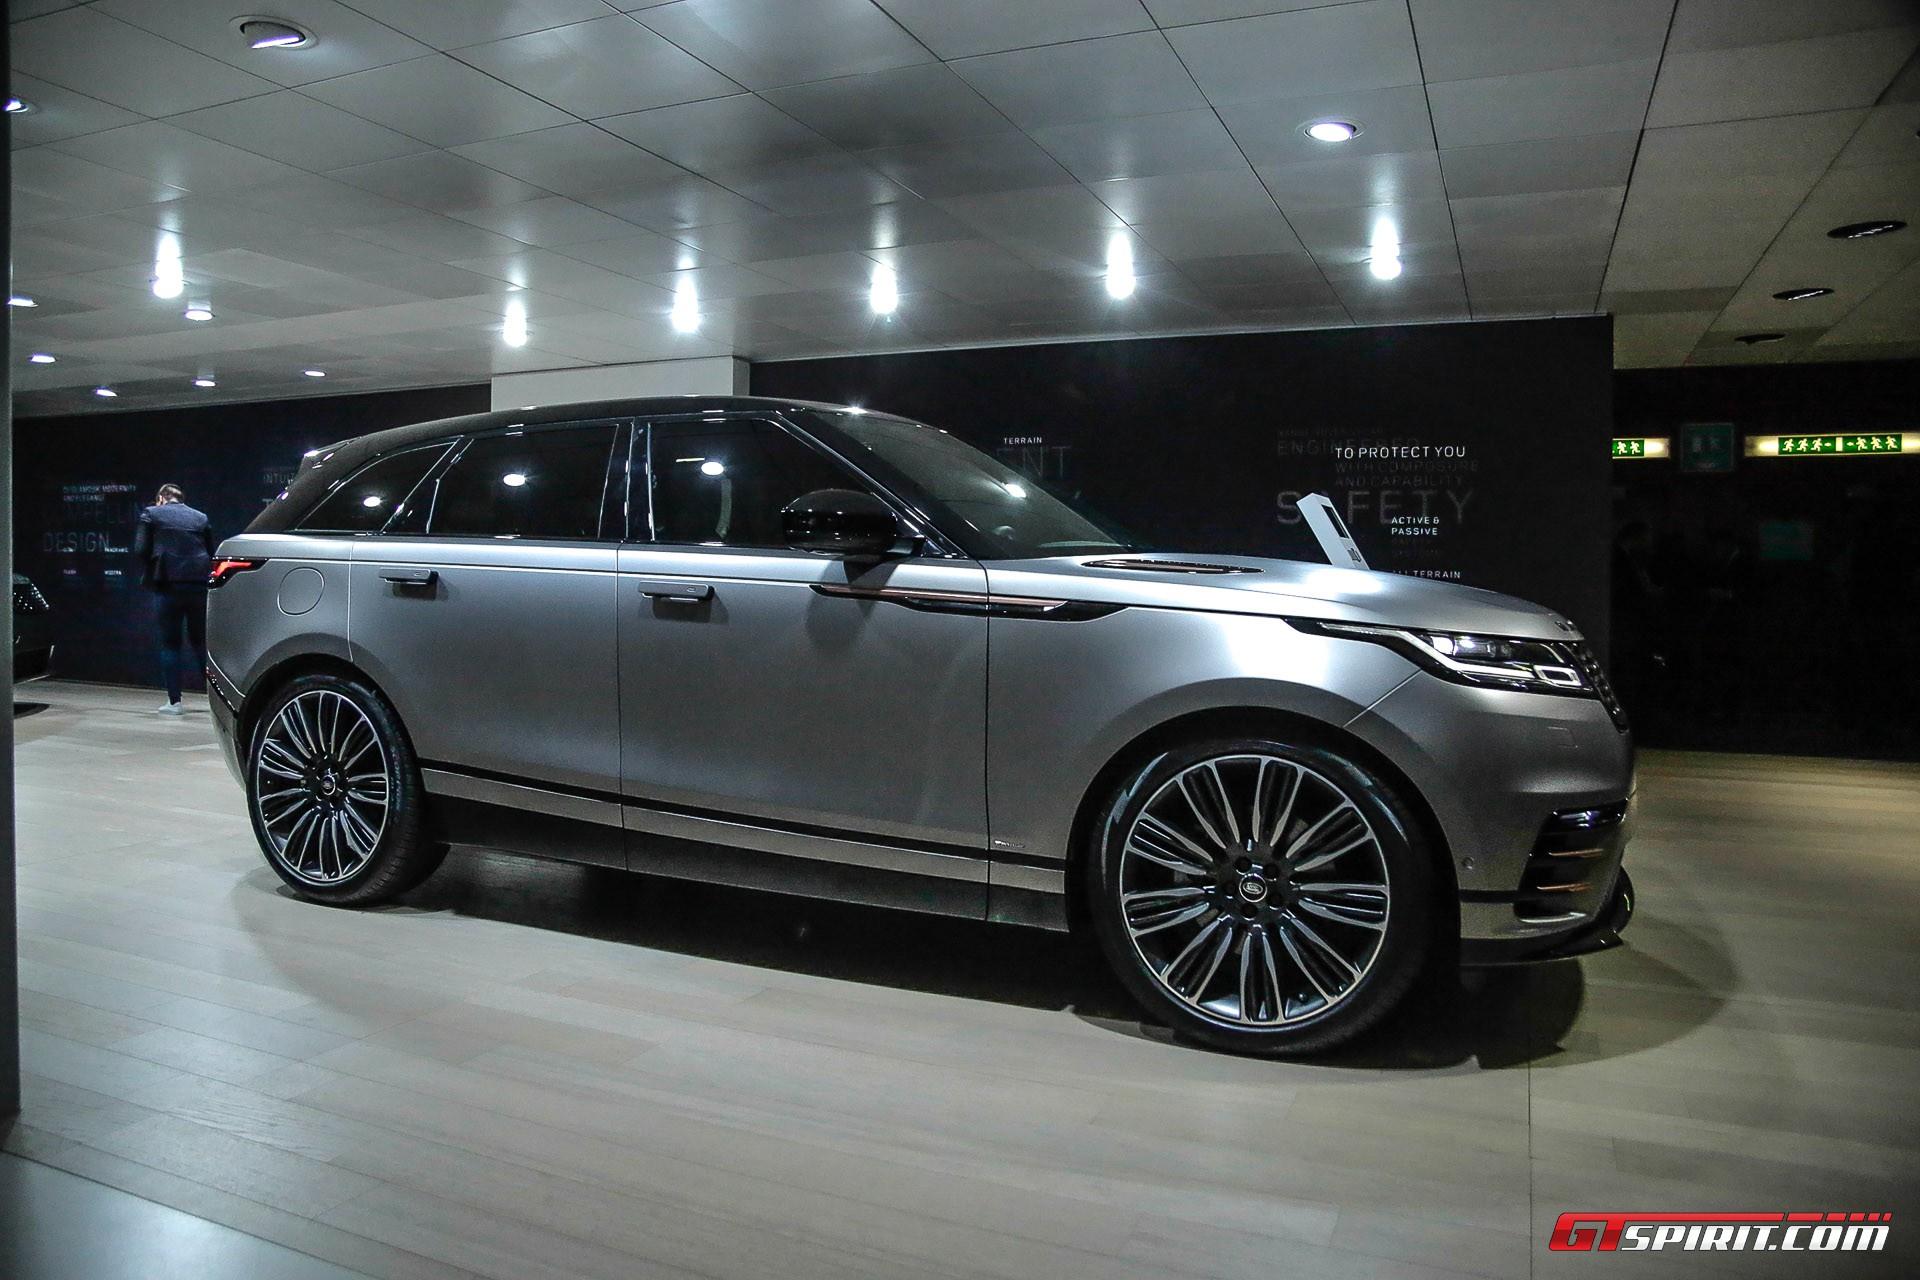 Range Rover Velar at Geneva 2017